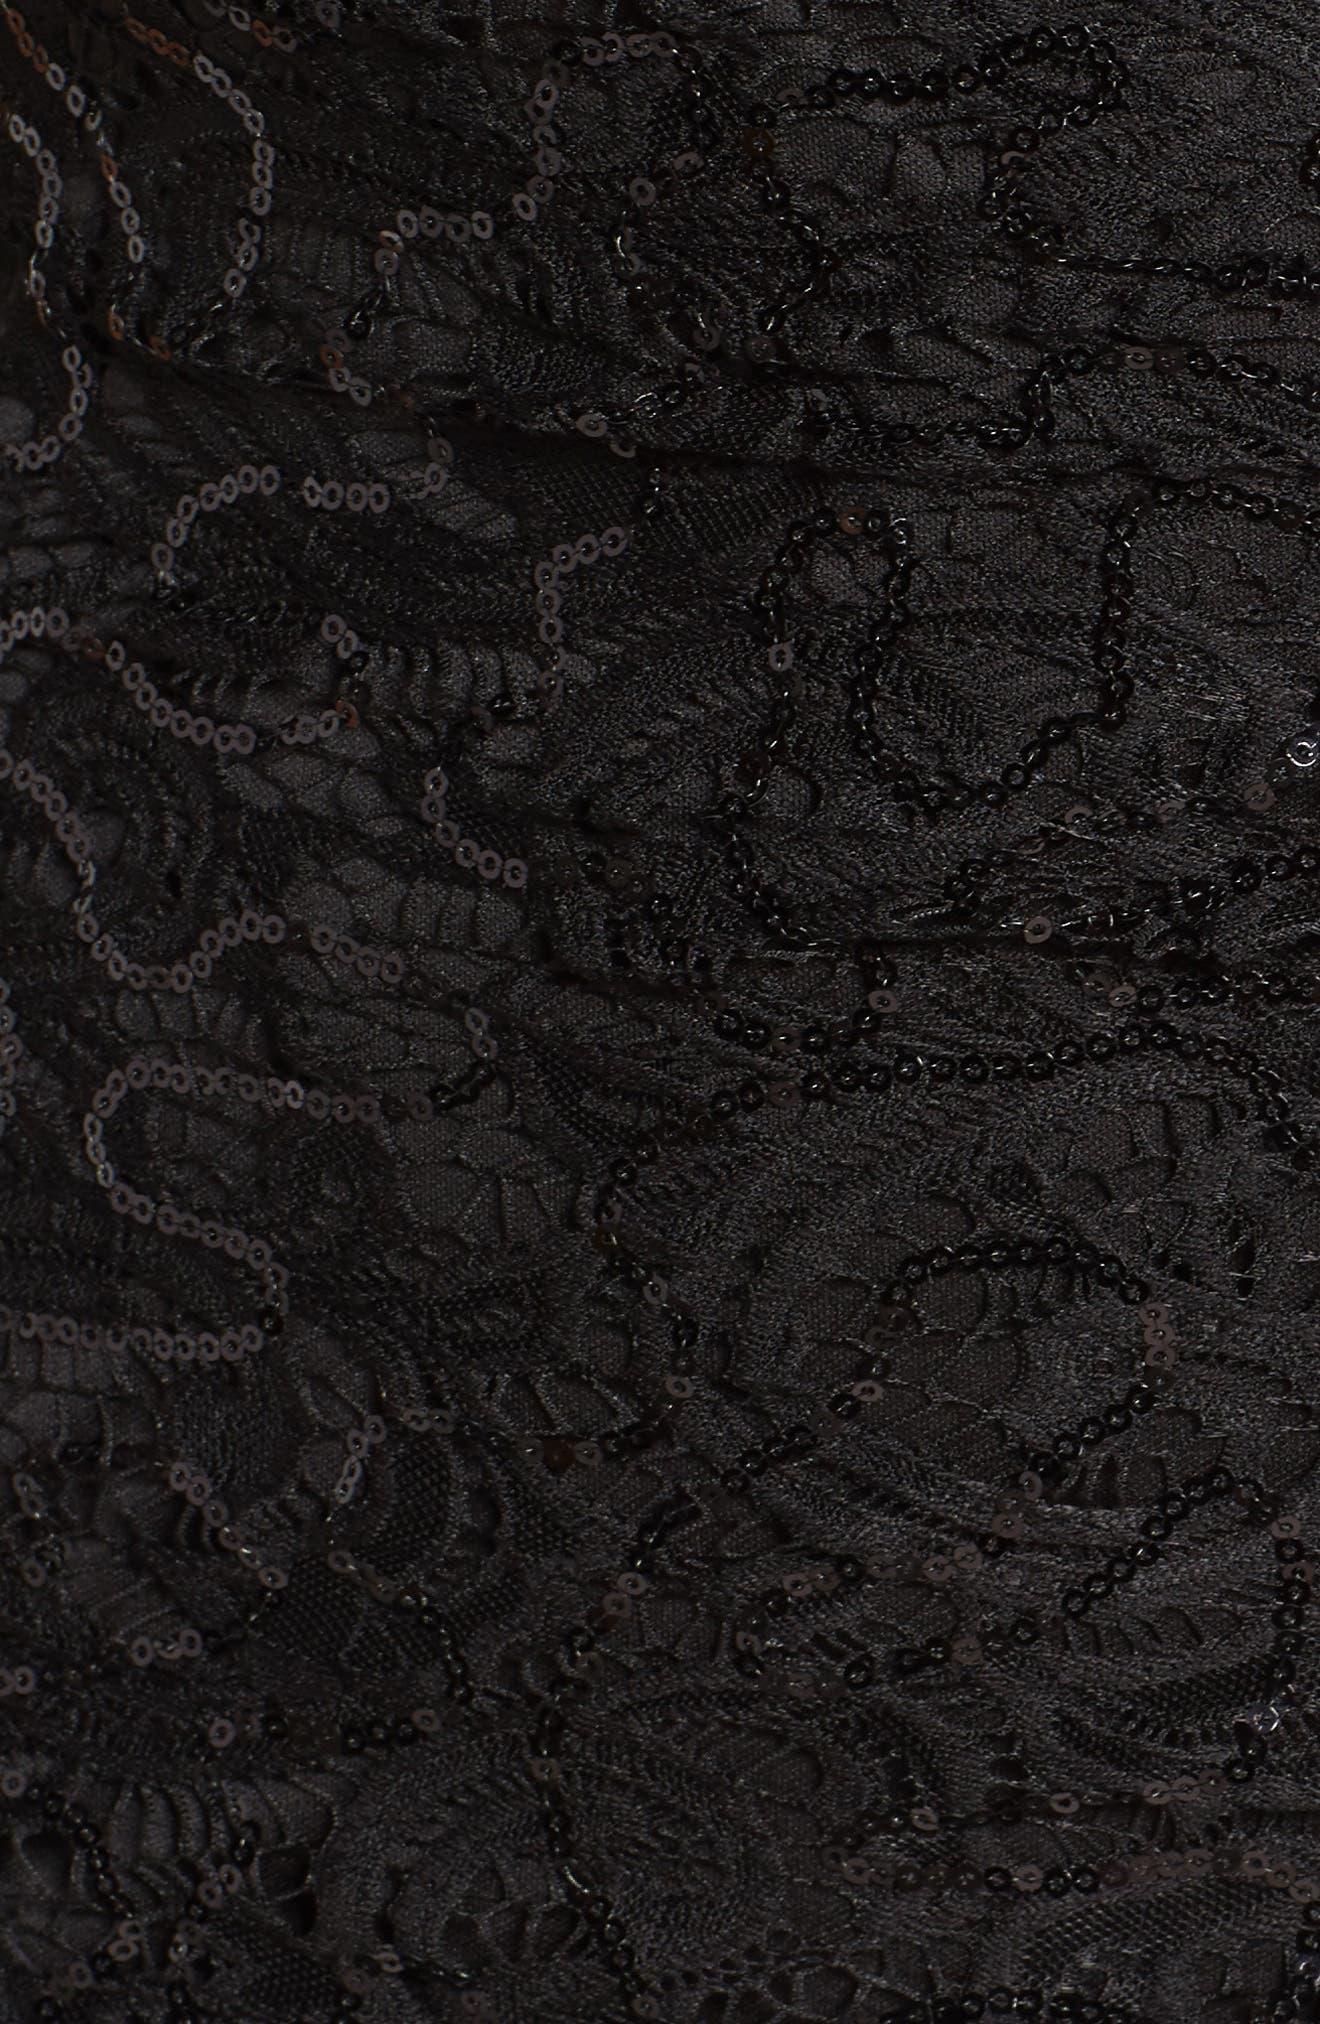 Sequin Lace One-Shoulder Gown,                             Alternate thumbnail 5, color,                             001